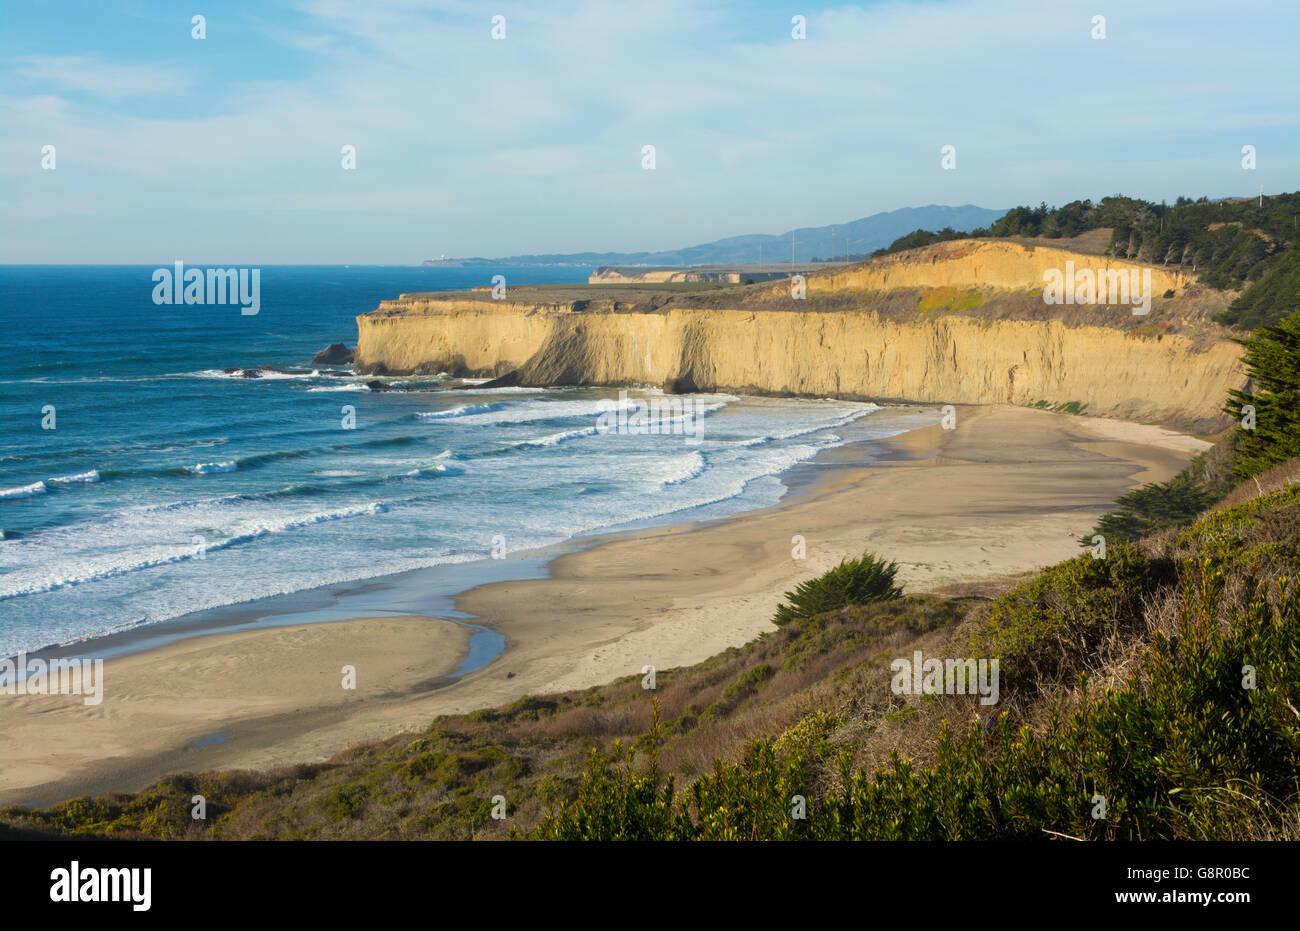 Pacific Coast Highway #1 California below Pebble Beach near Carmel beautiful cliffs and waves of ocean - Stock Image